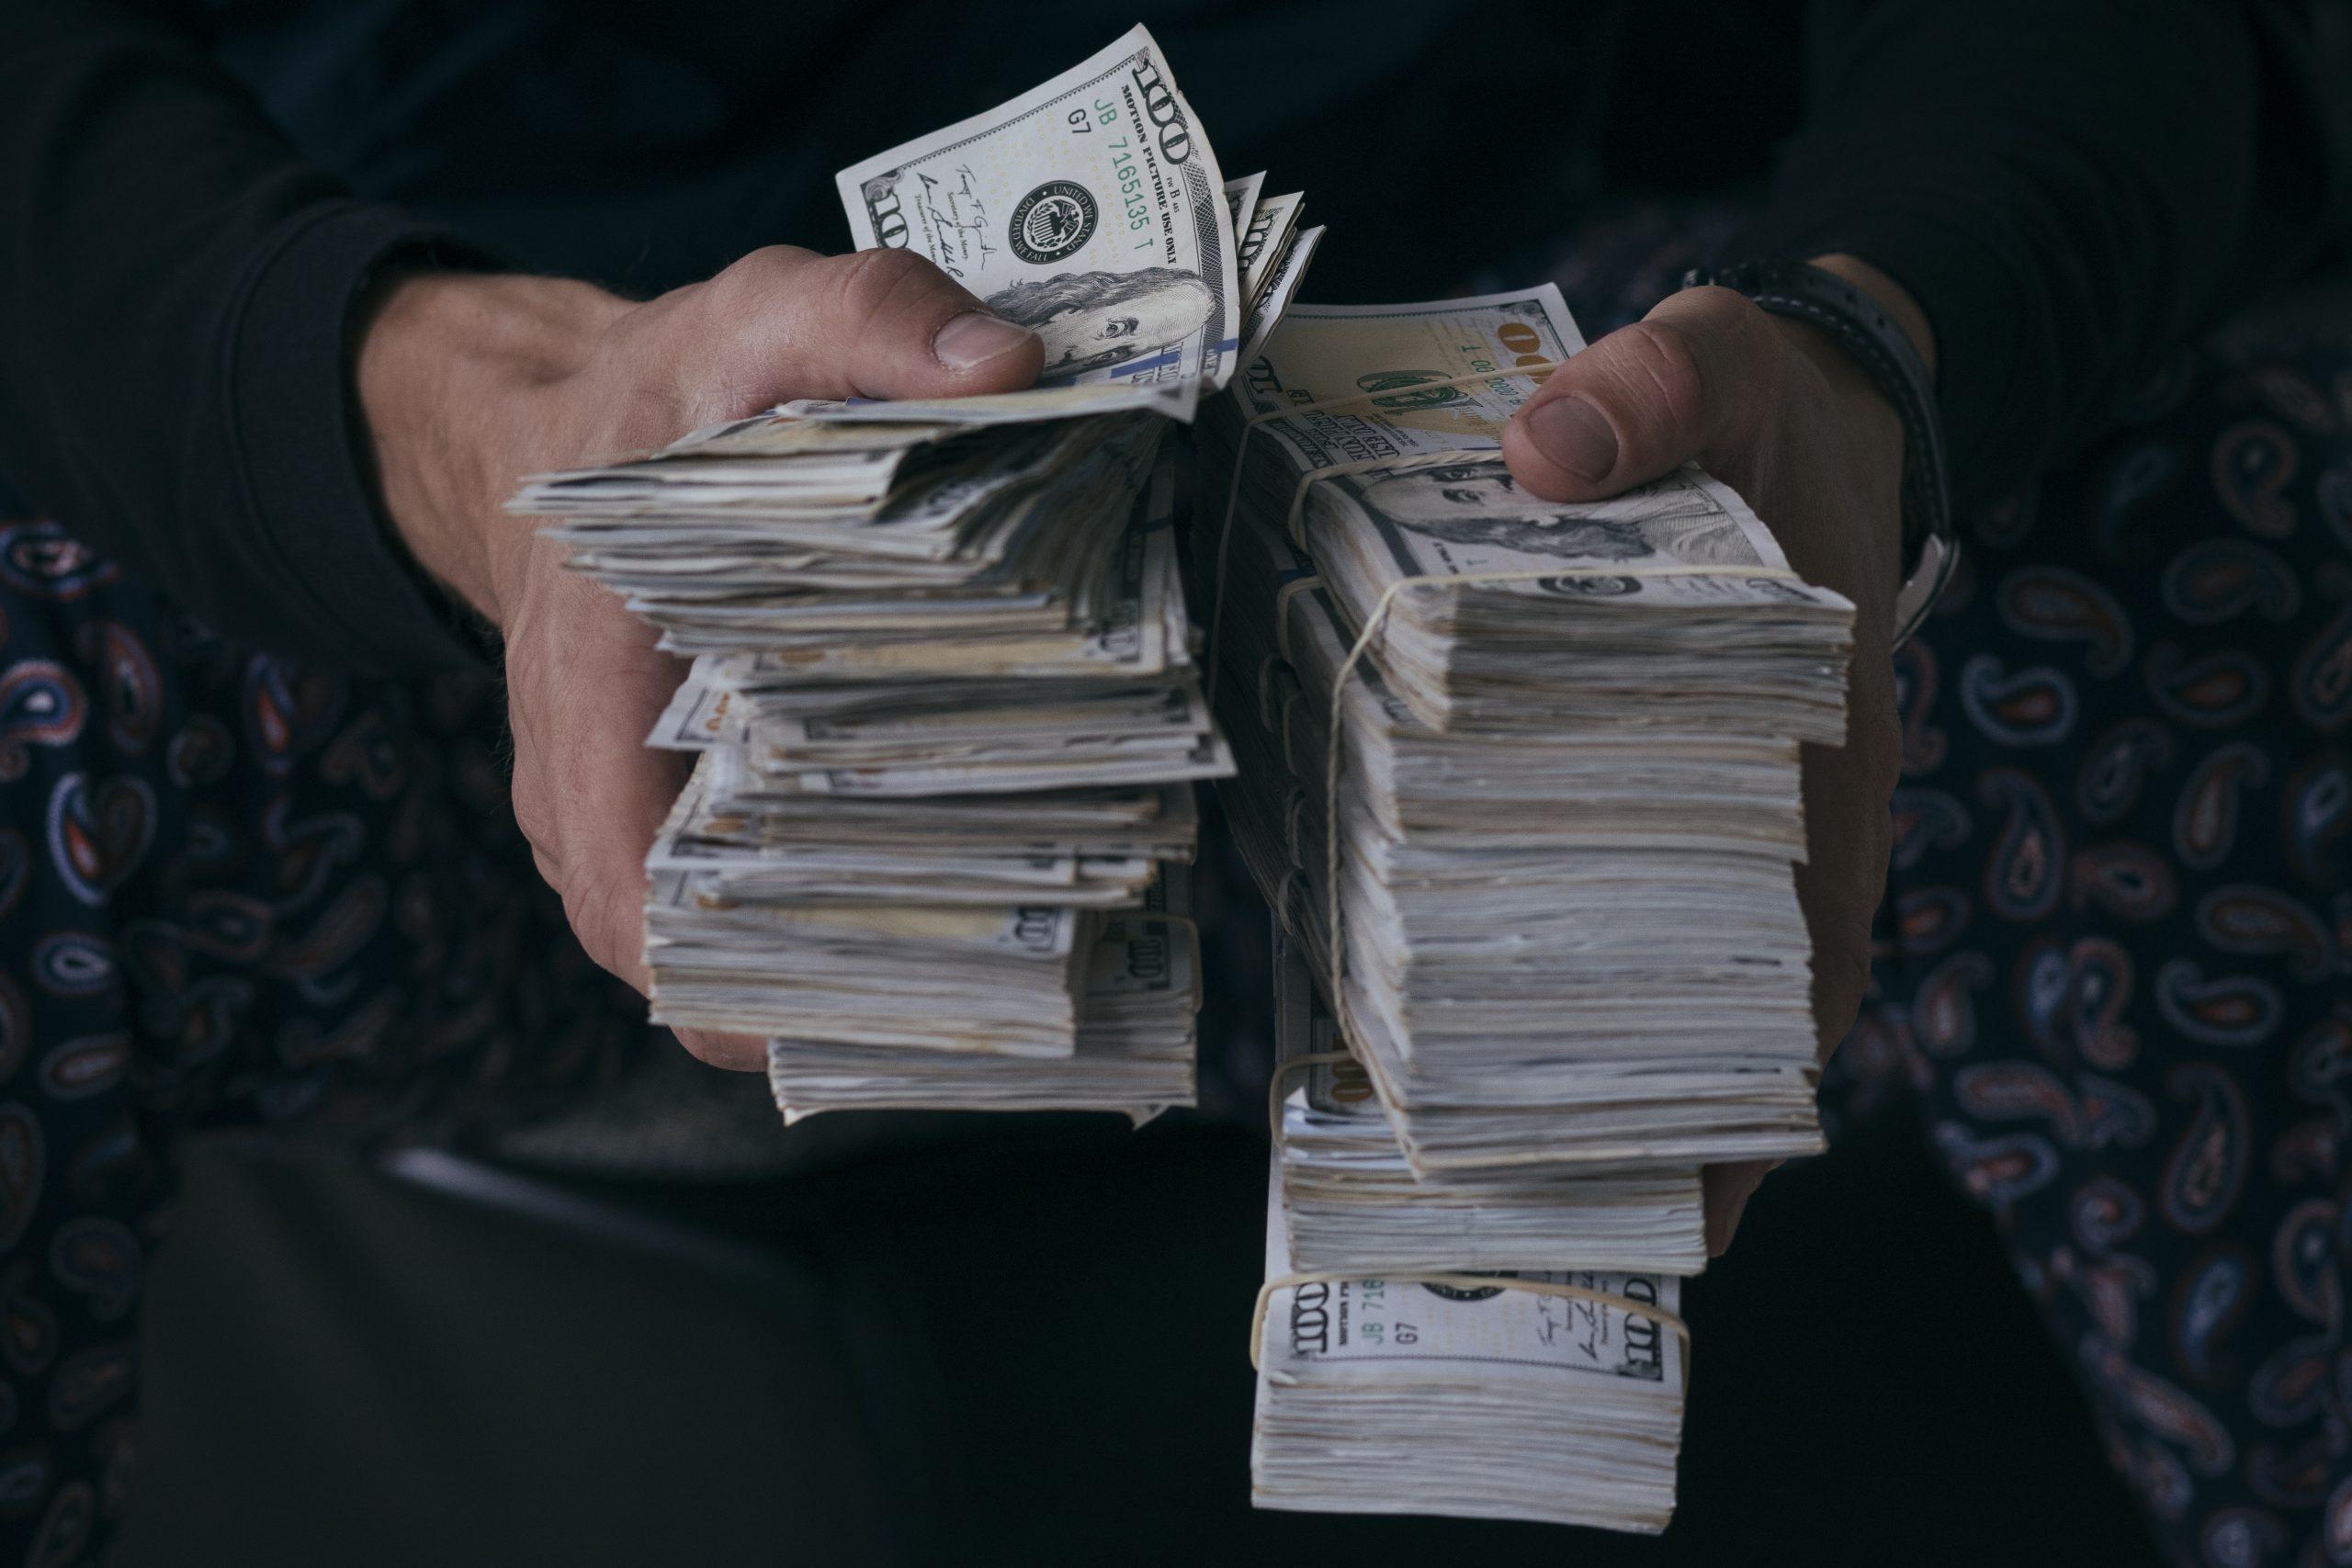 Cardano Summit: Often money is followed by more money